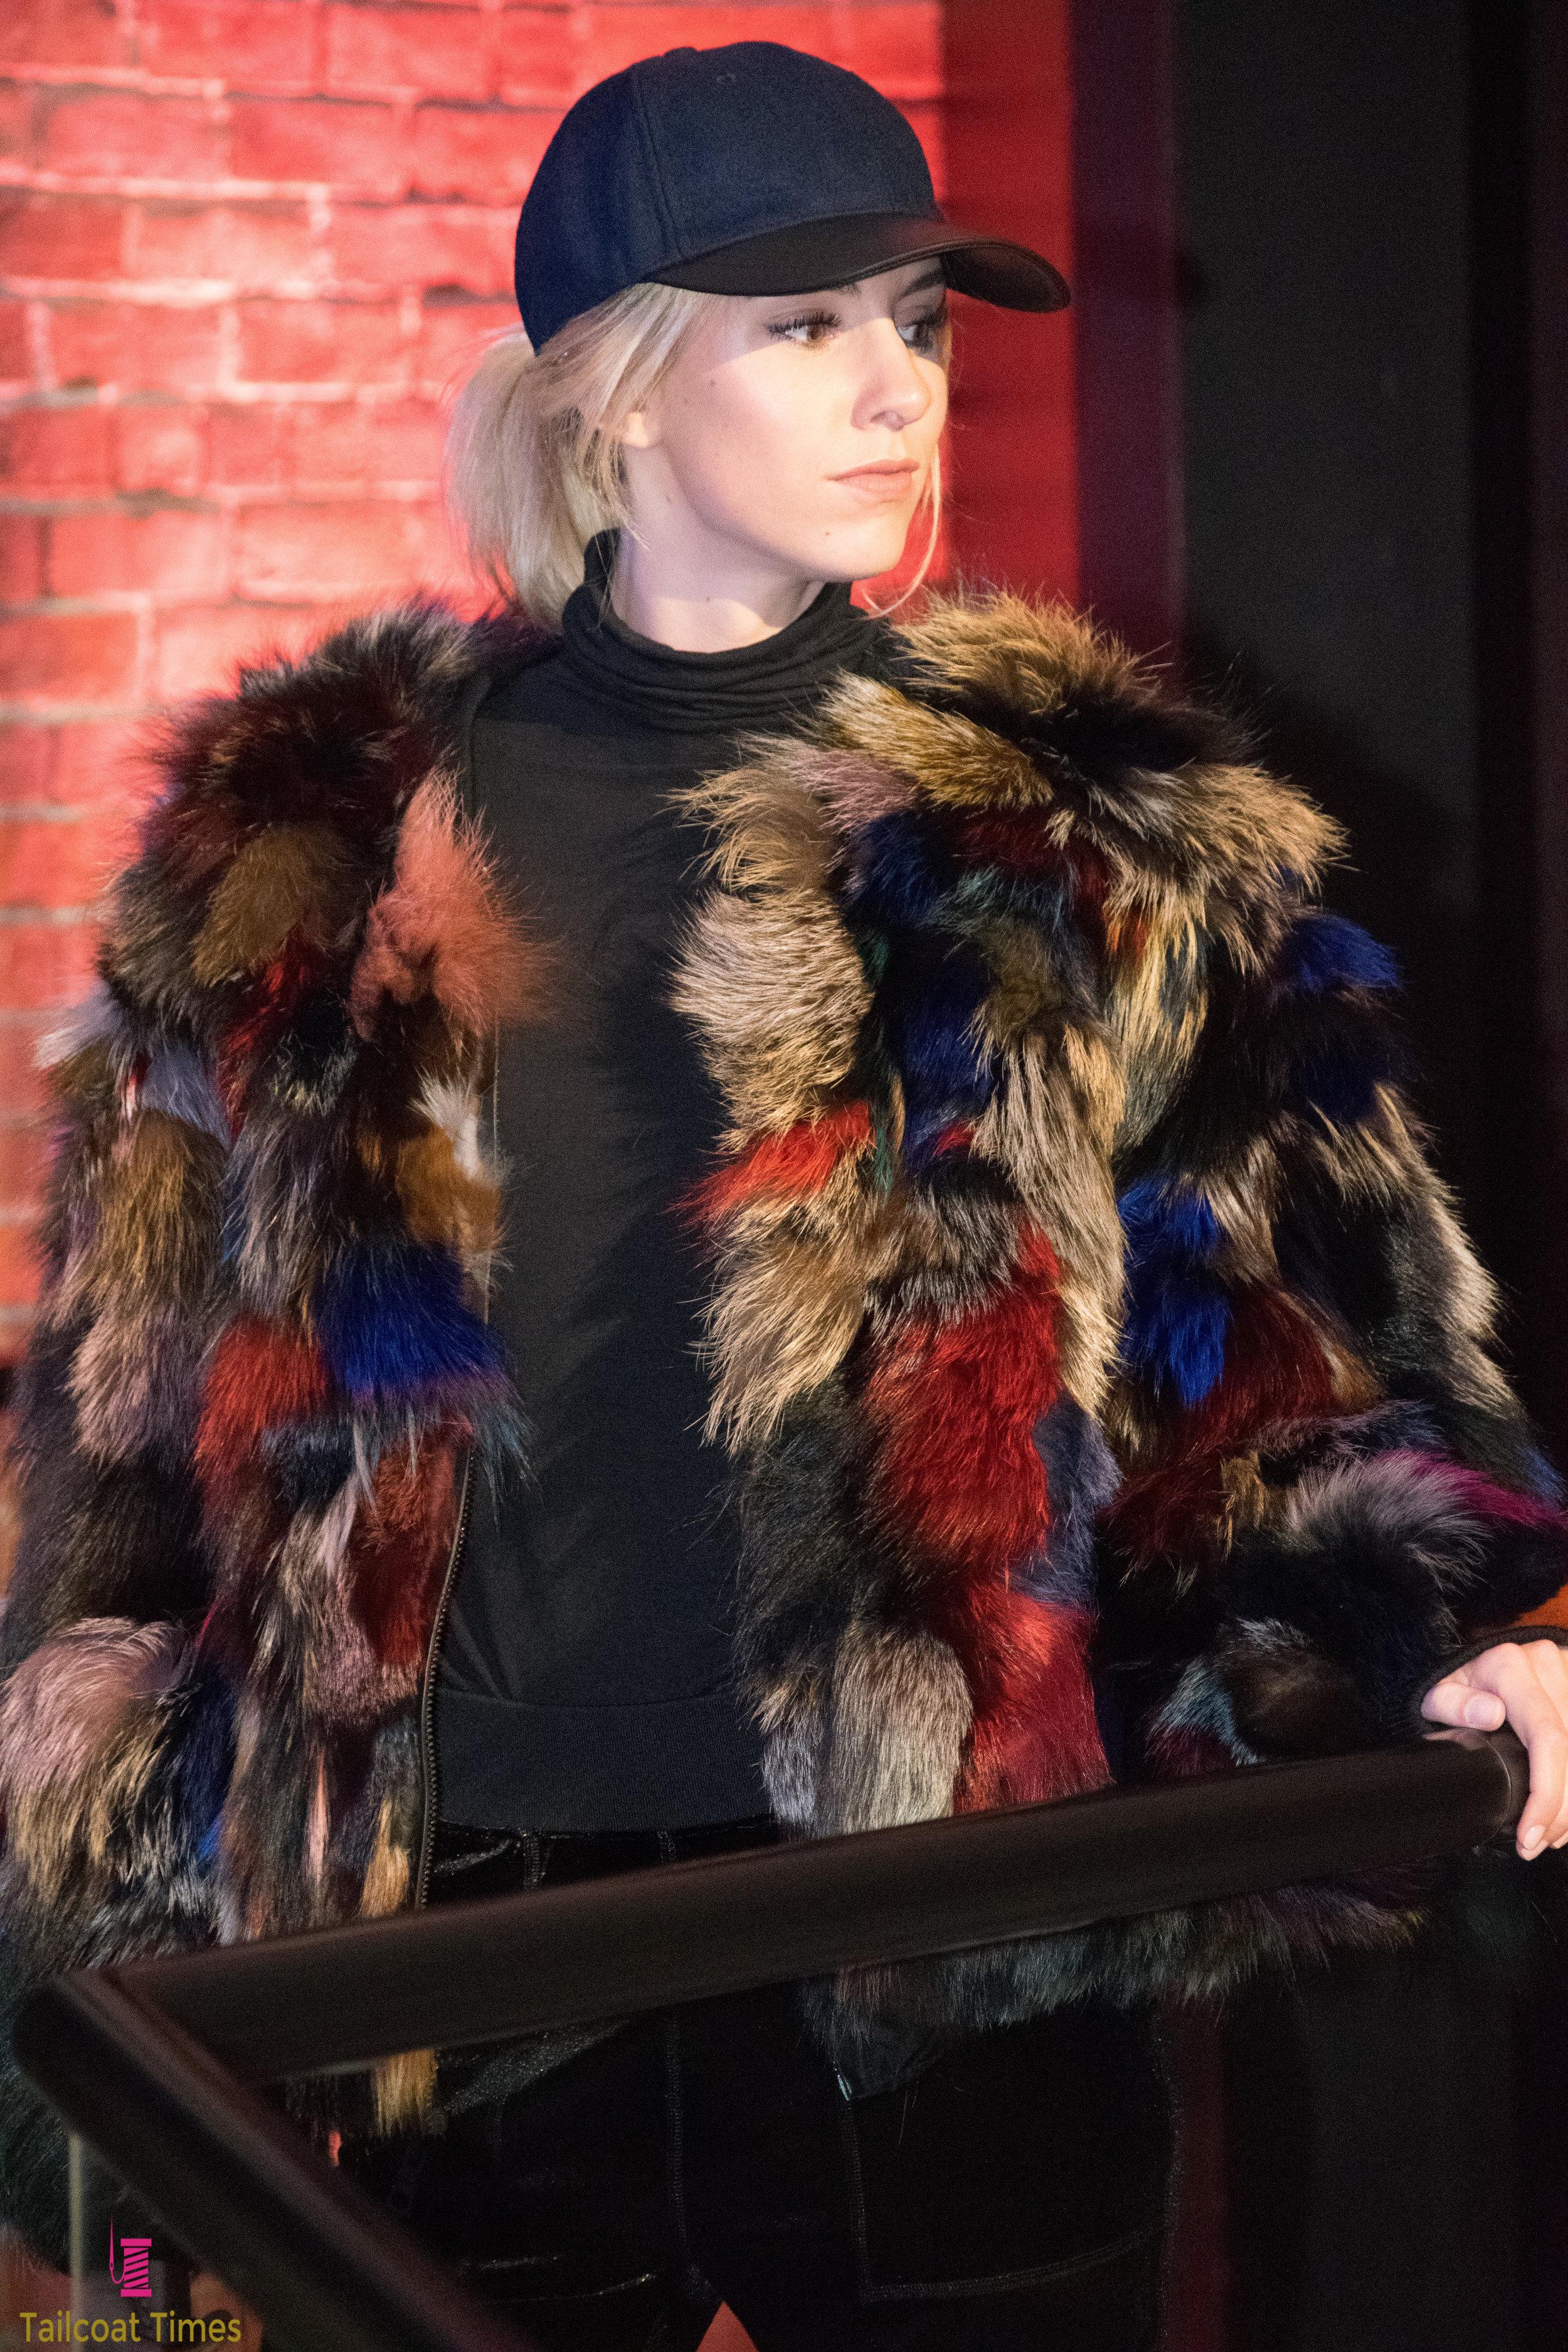 FashionablyLate_TrunkShow_Tailcoat Times (46 of 48).jpg